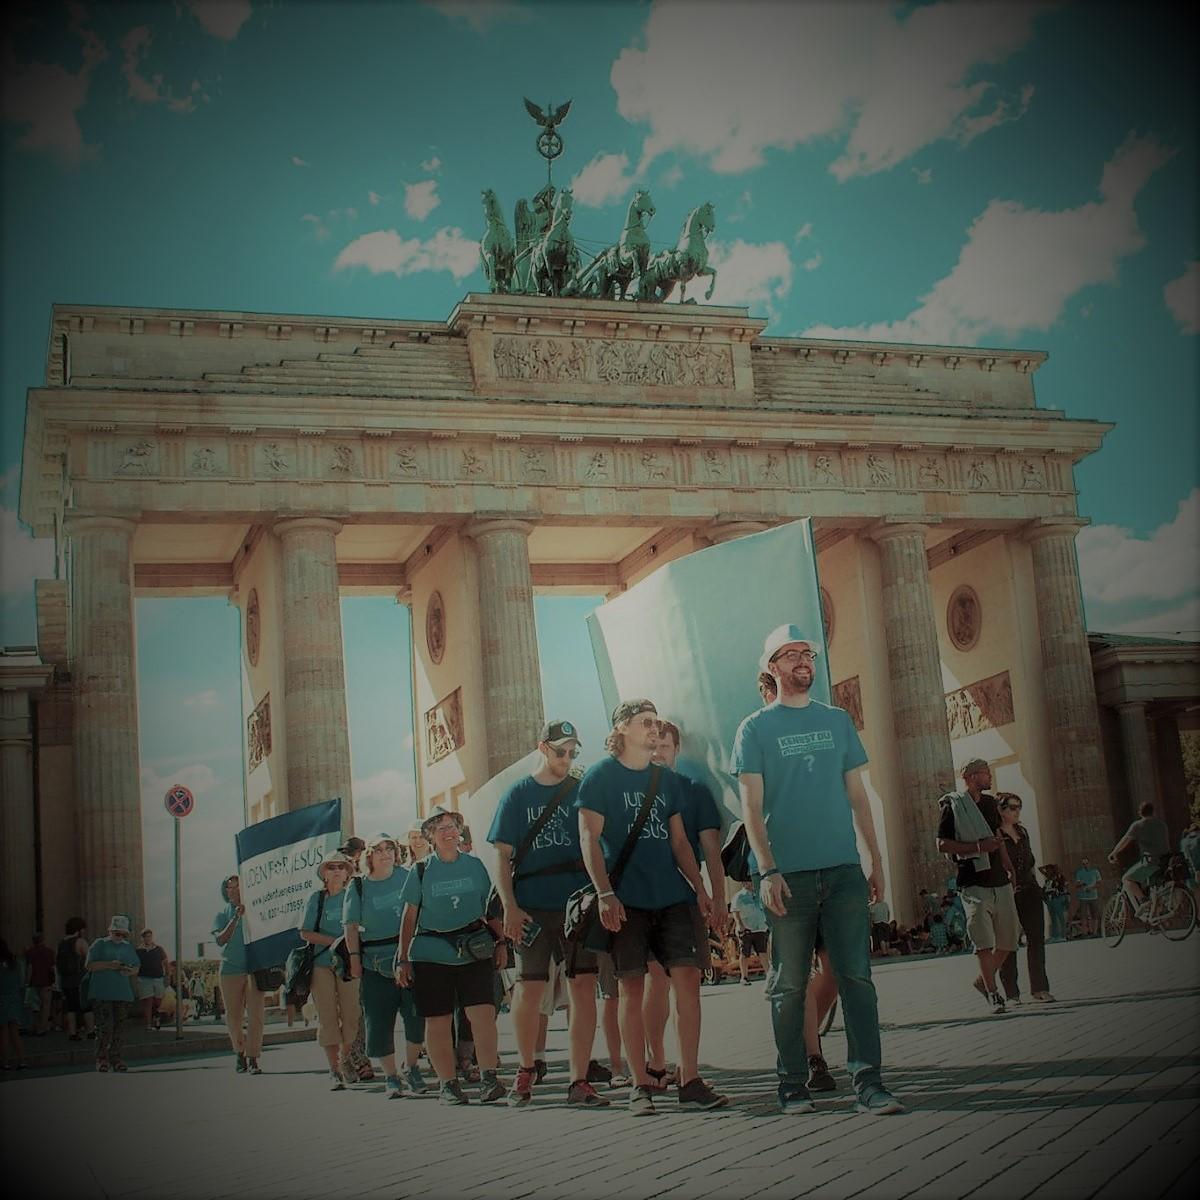 Berlin endlich!